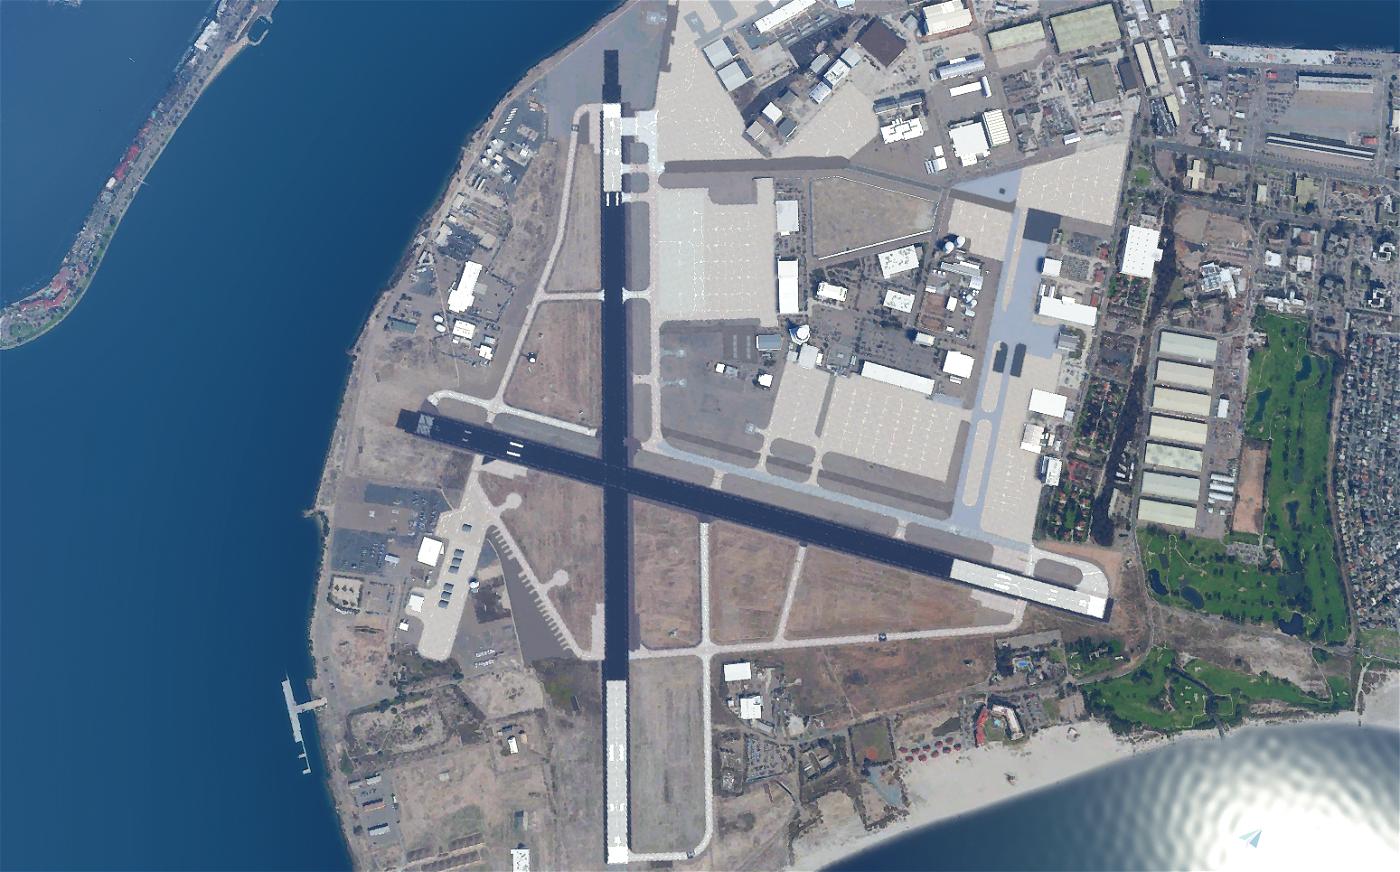 KNZY - North Island Naval Air Station (Halsey Field)